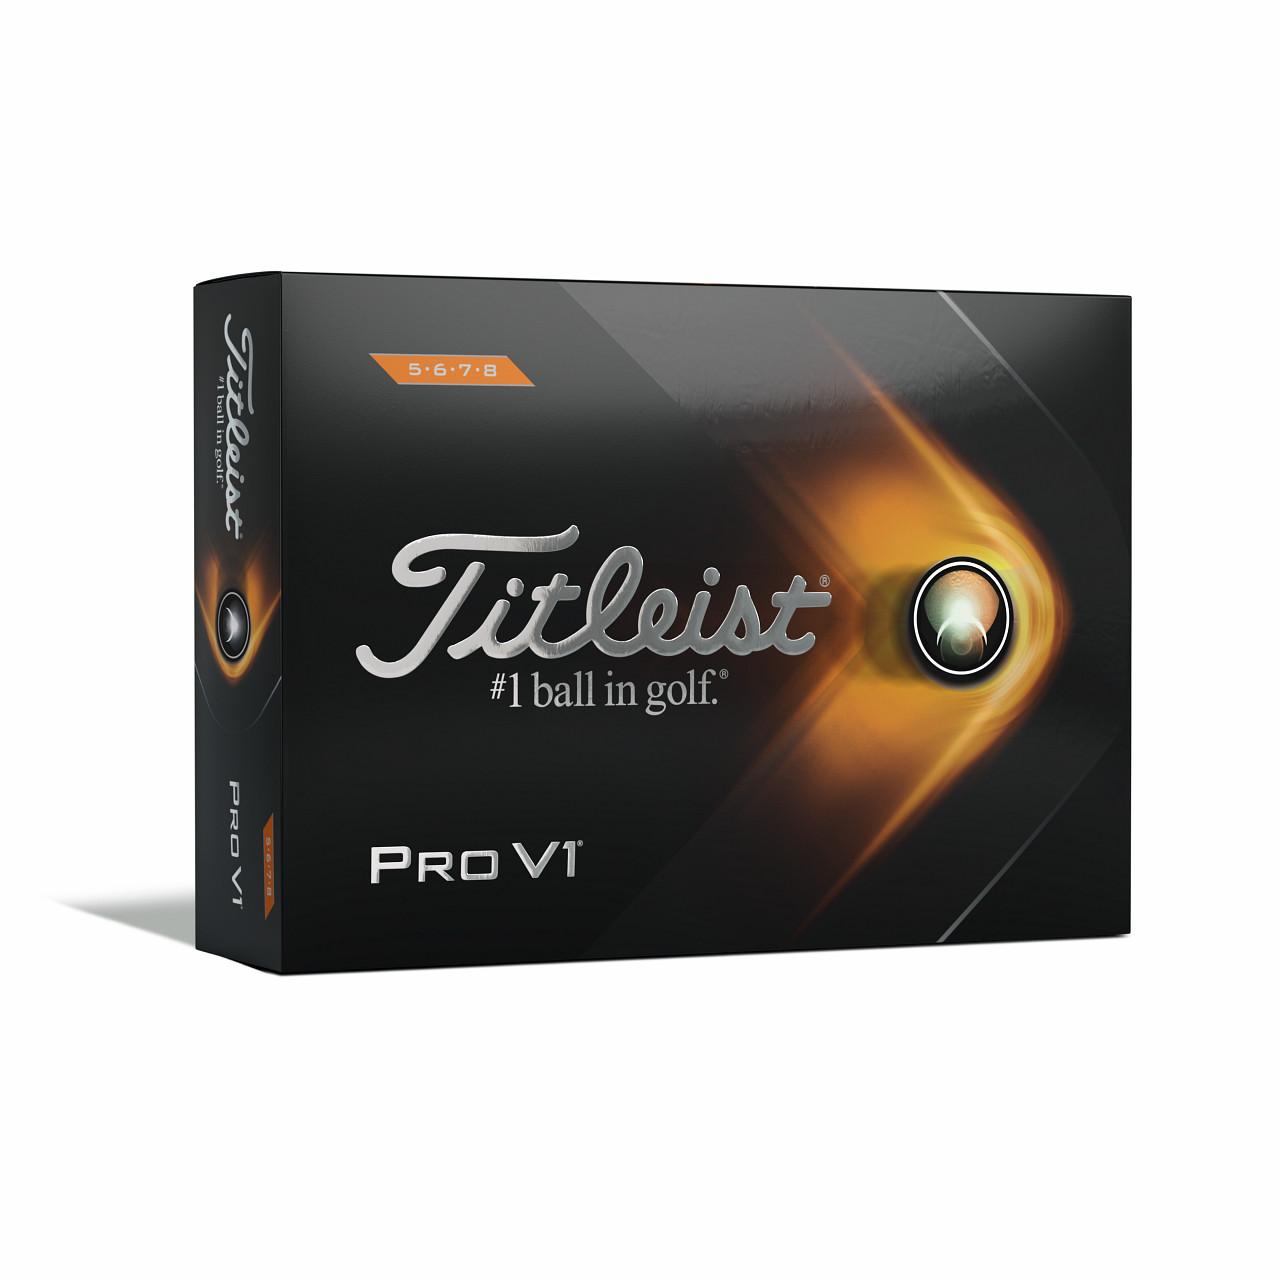 Titleist Pro V1 HIGH #